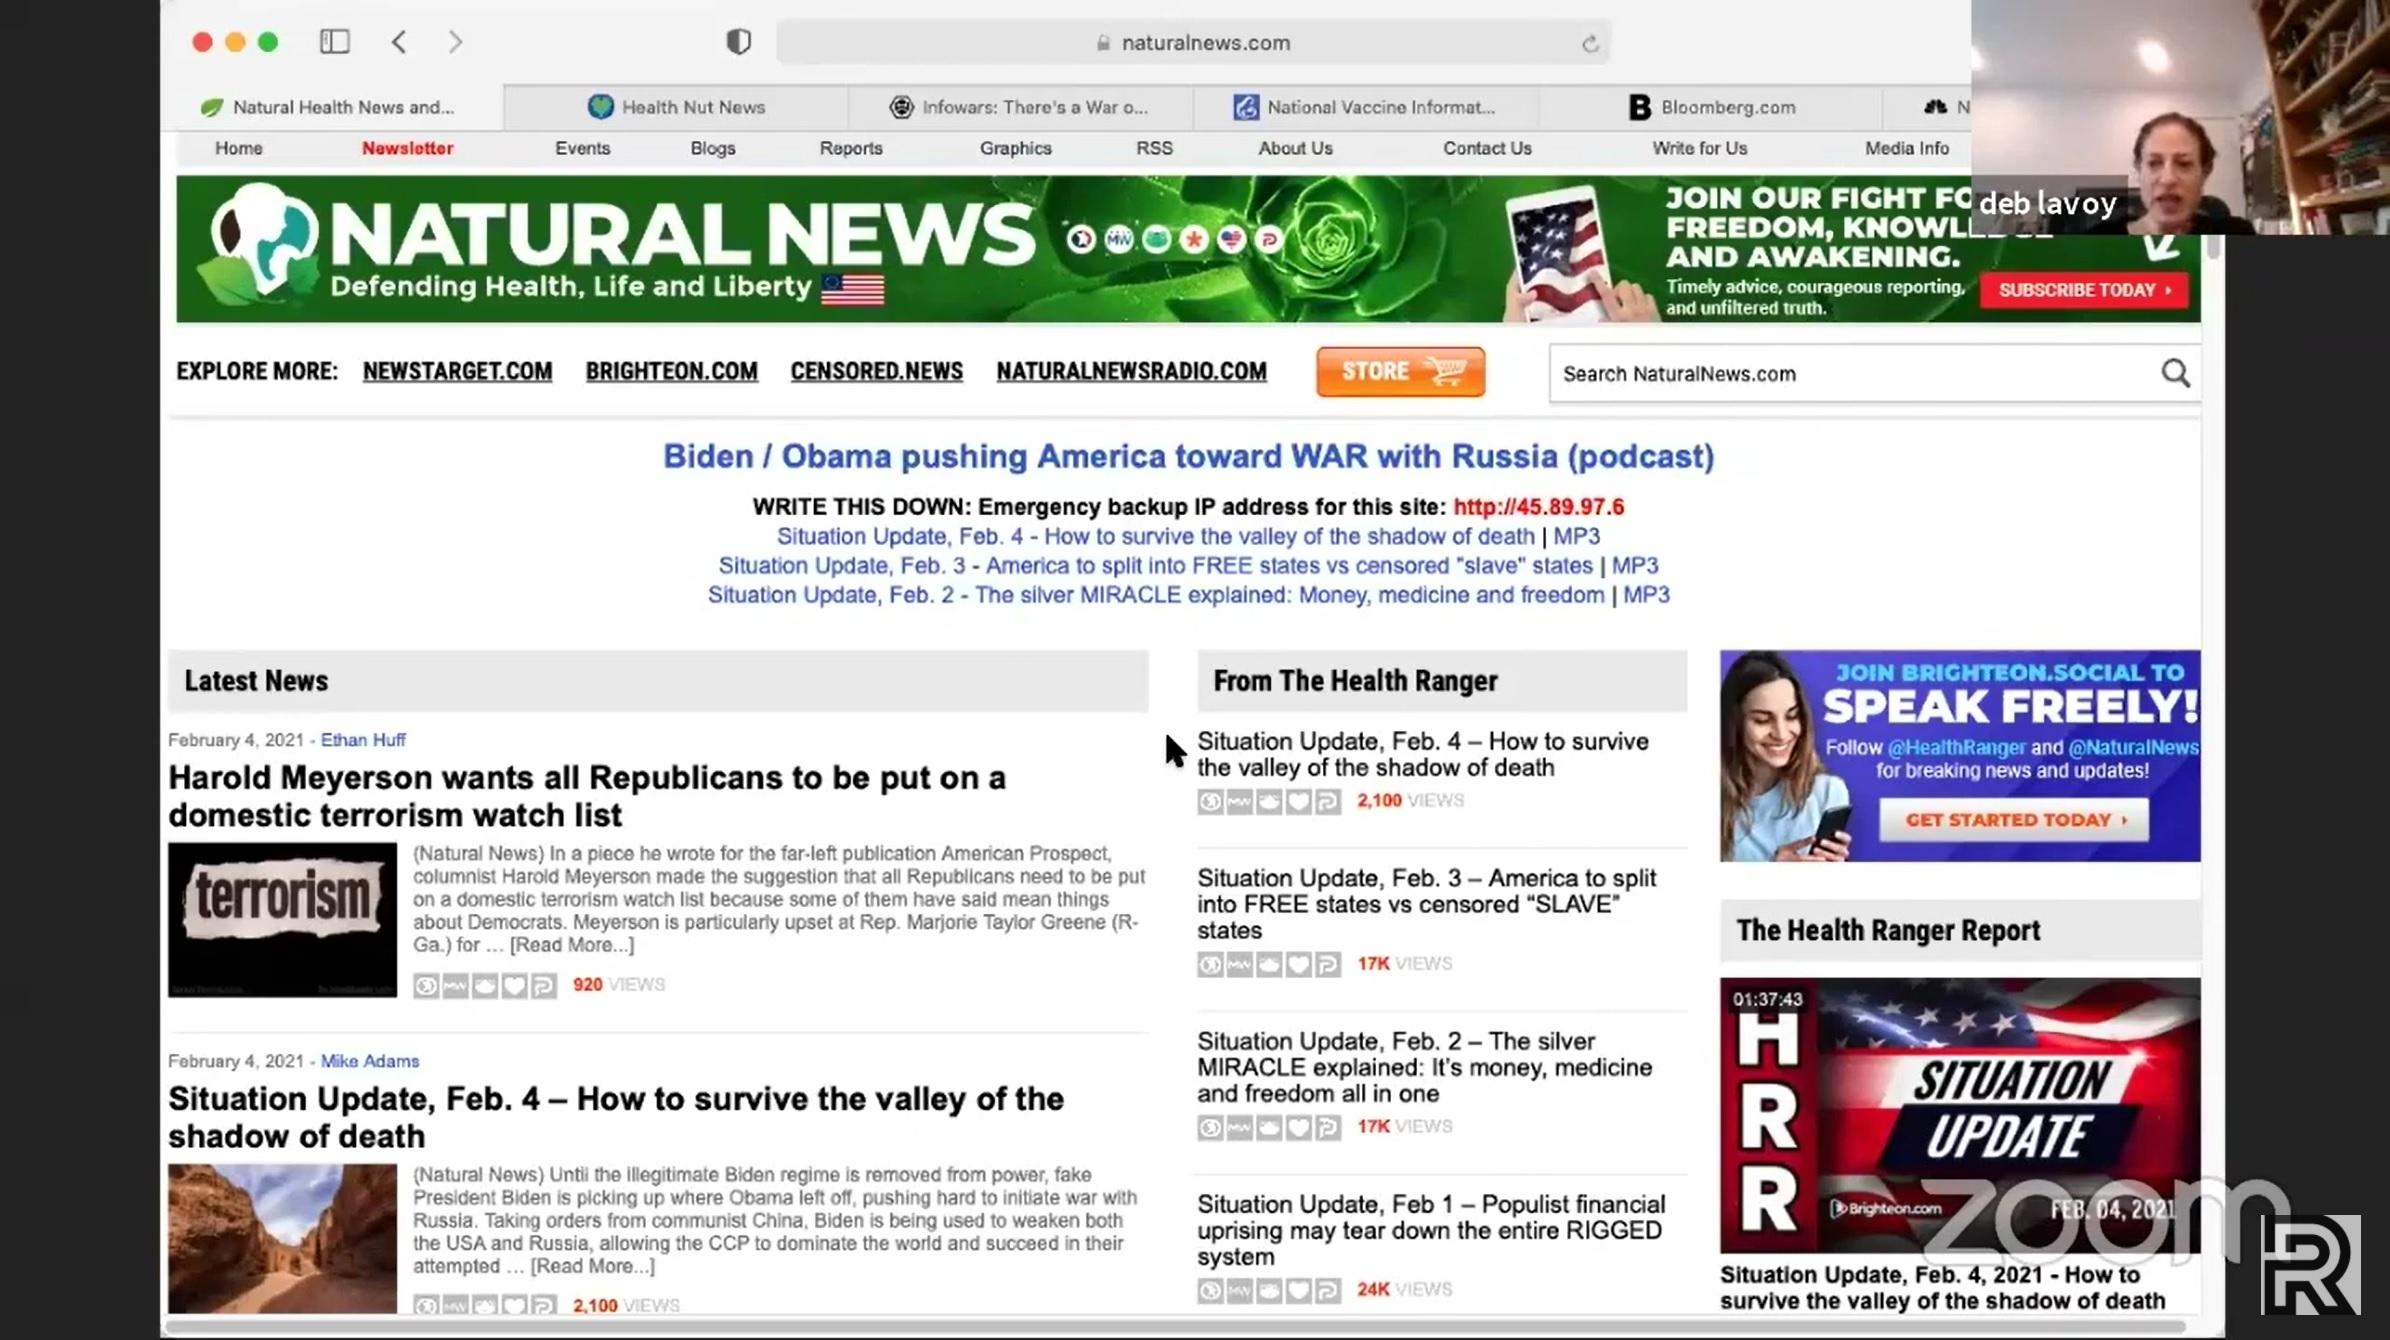 A screenshot of Natural News homepage.